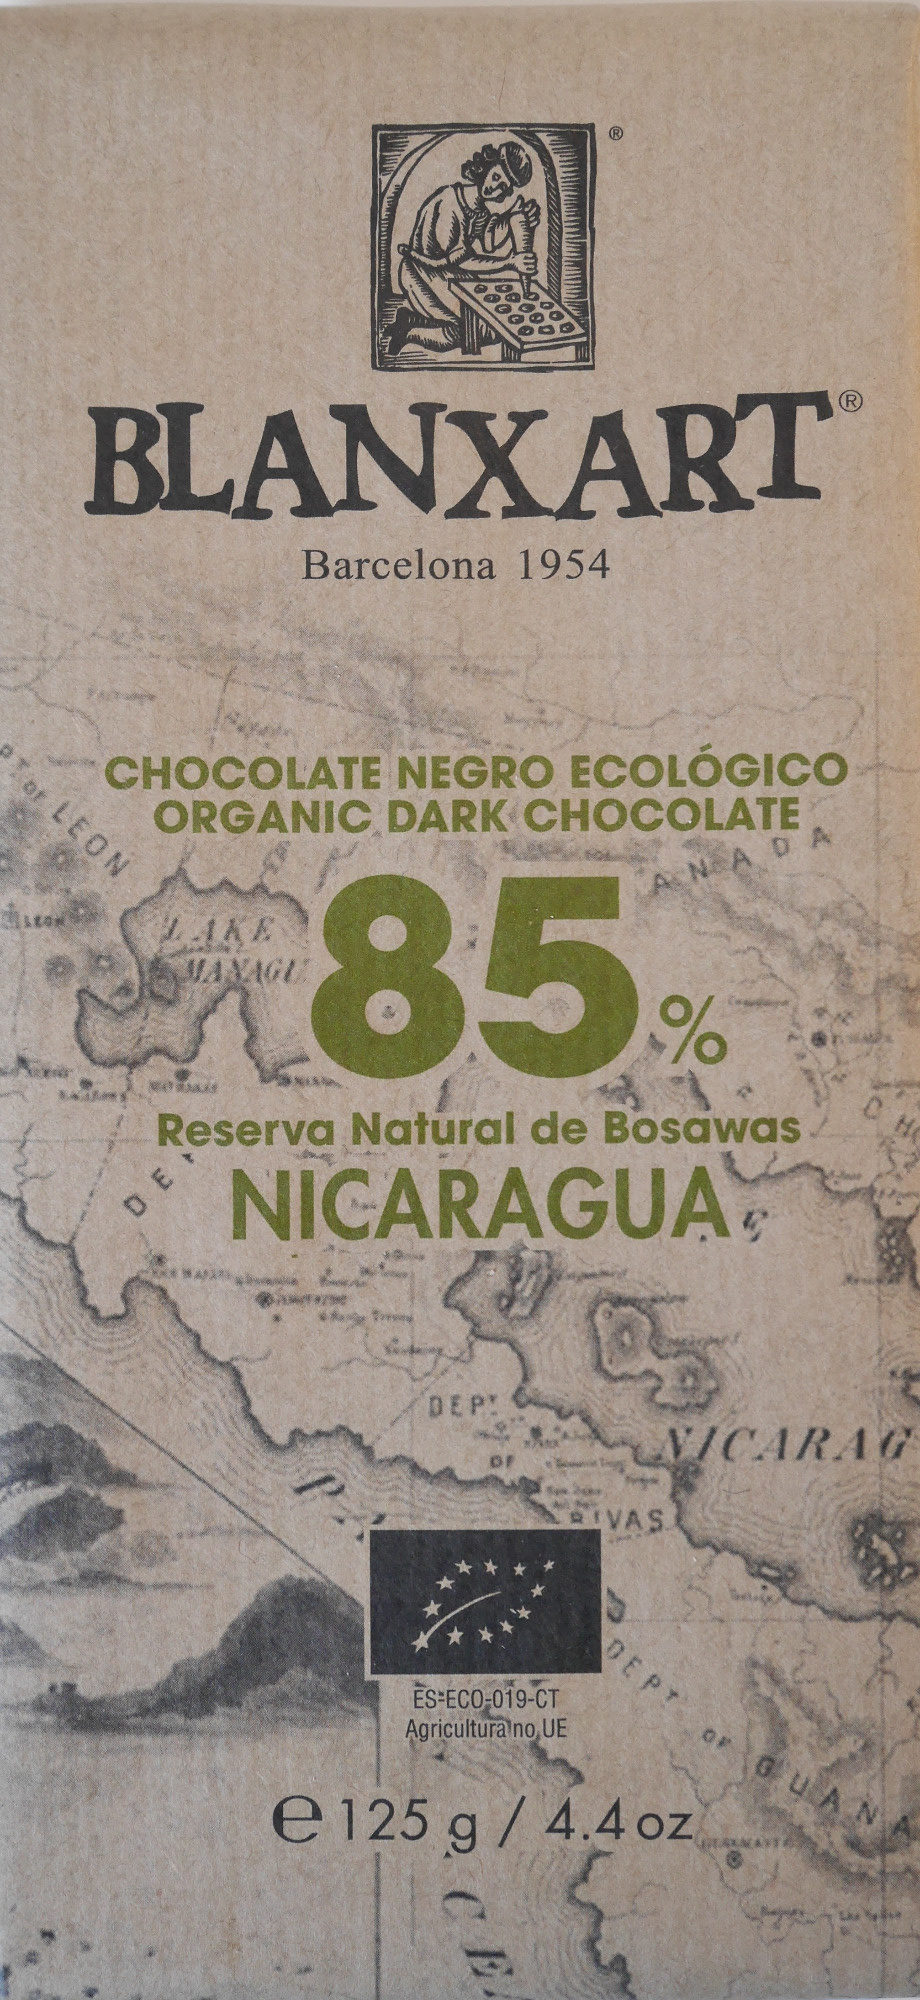 Chocolate negro ecológico 85 % Nicaragua - Producto - es